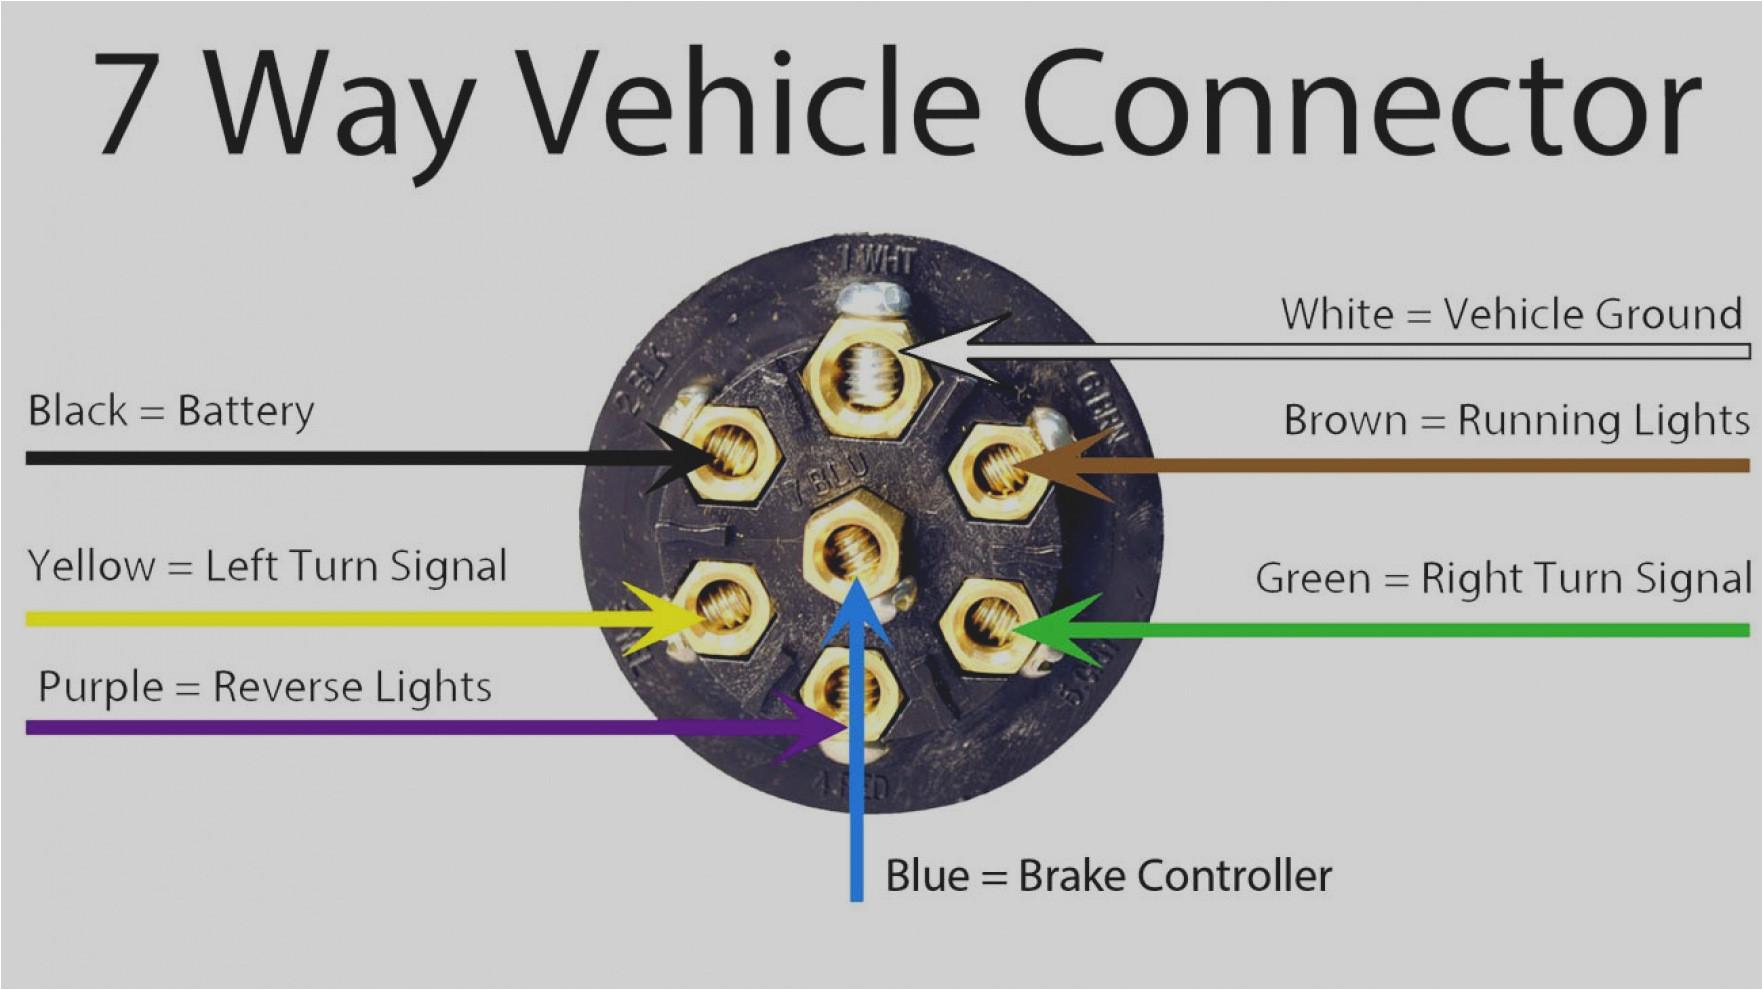 hitch 7 pin wiring diagram schema diagram database 6 pin wiring diagram tow hitch